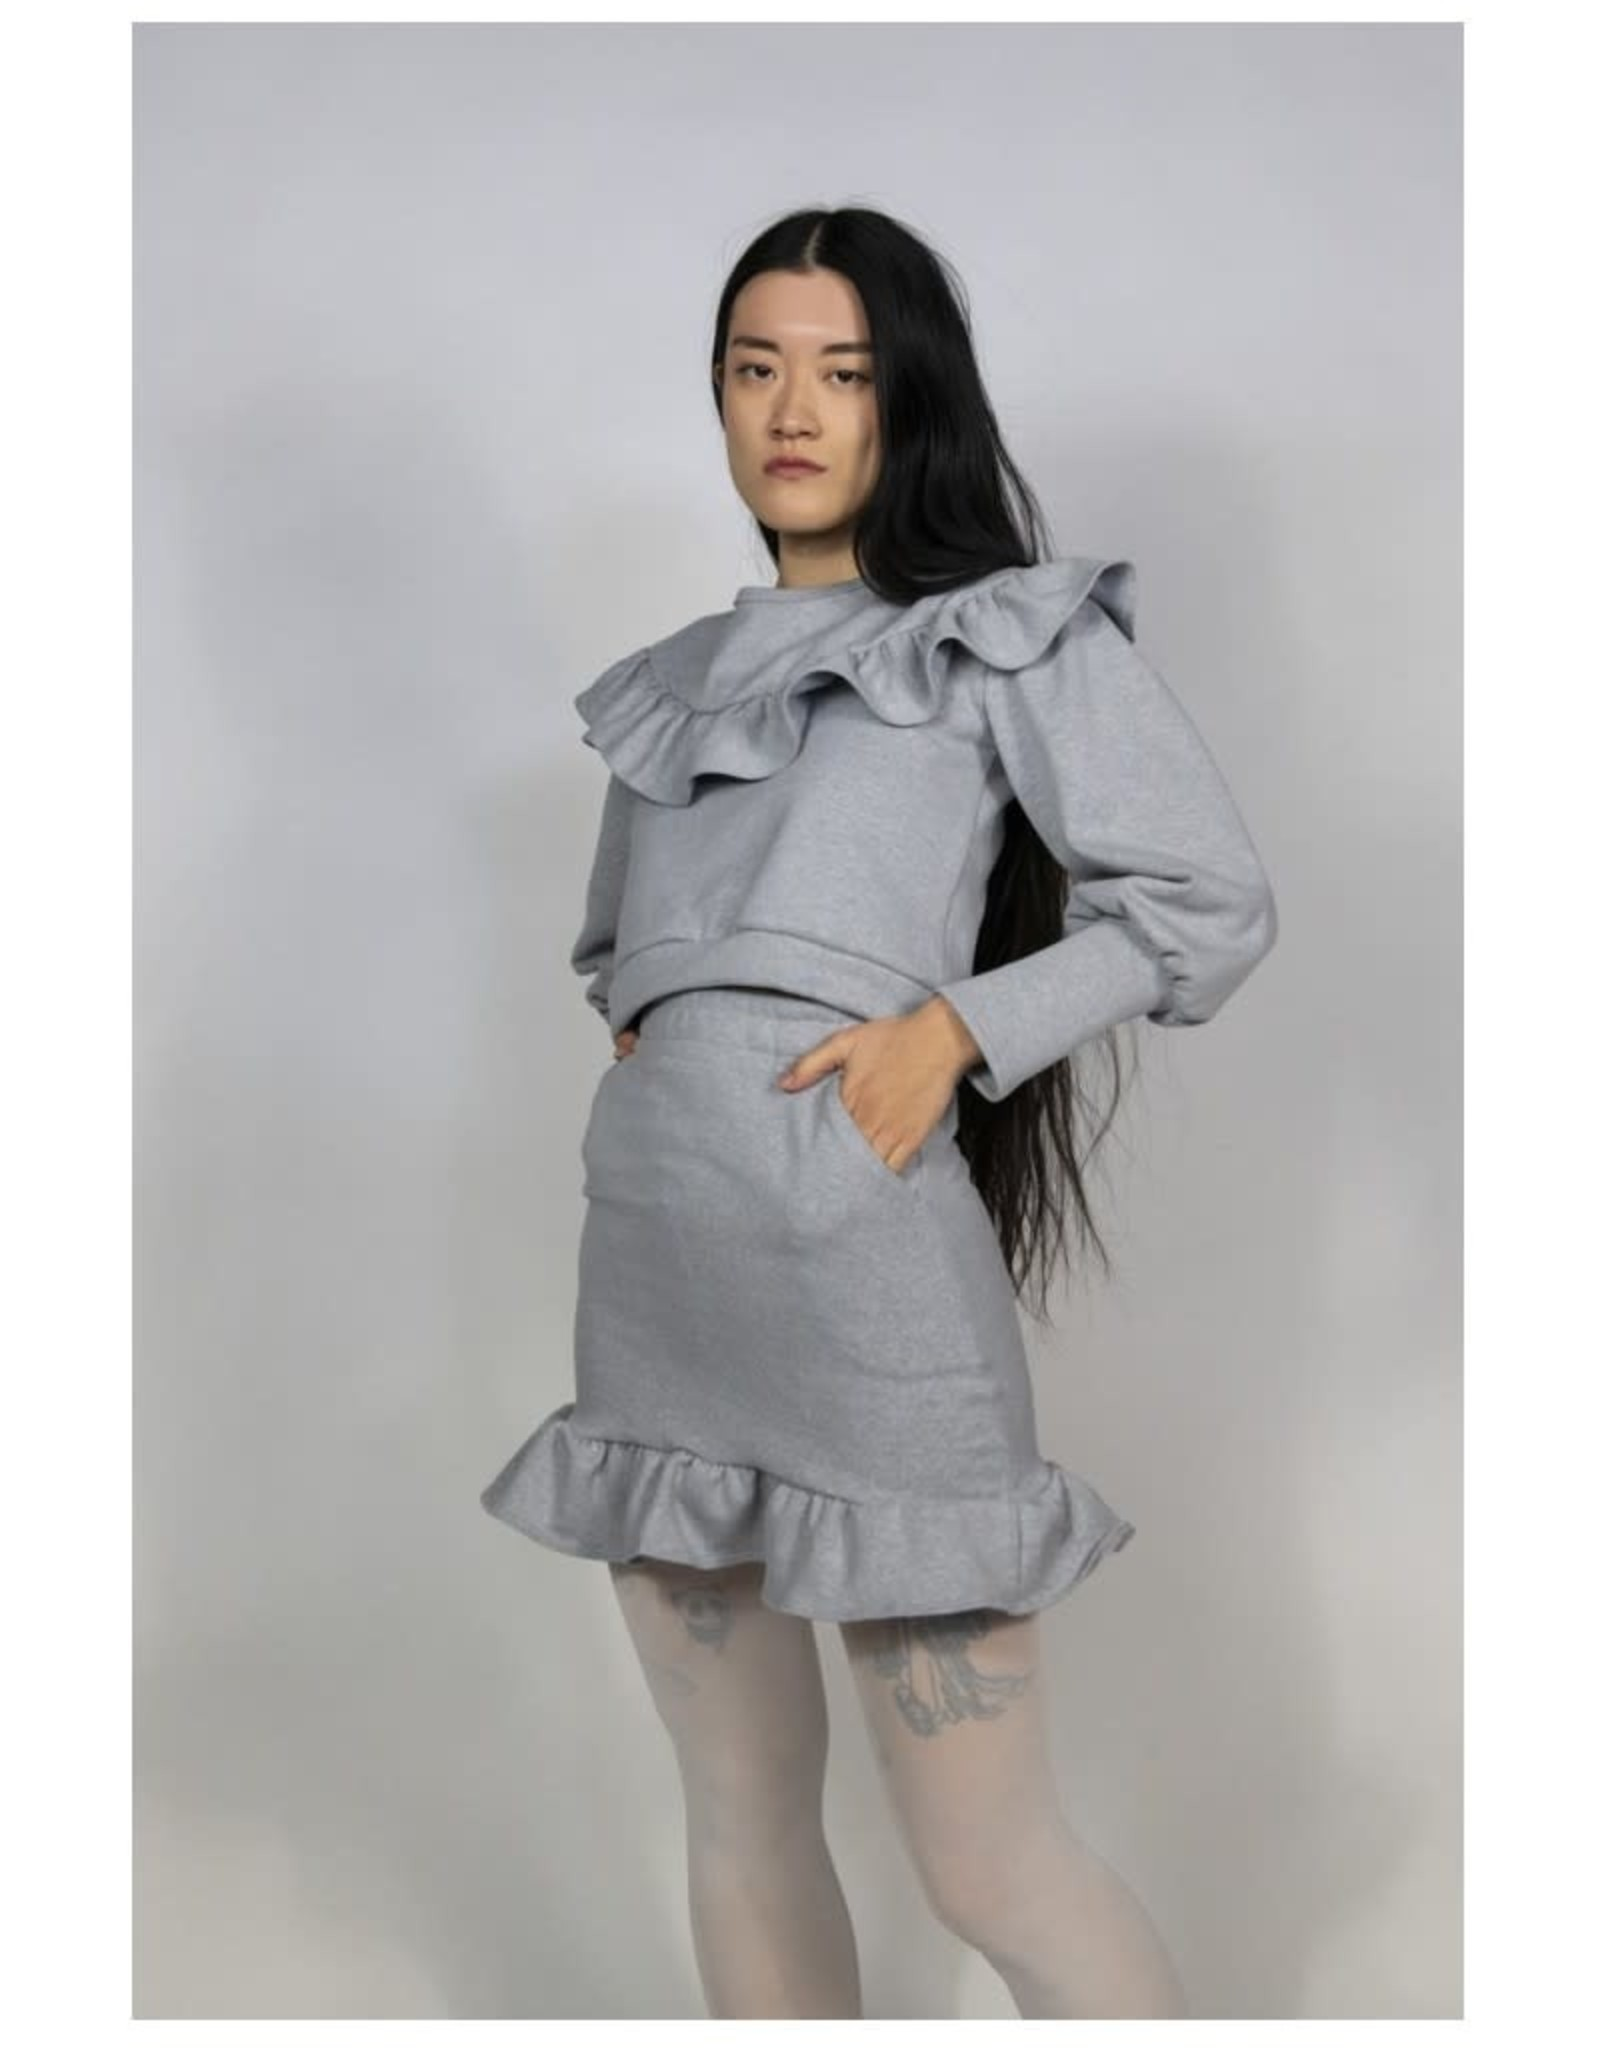 RightfulOwner Fleece Sweatshirt PE21 Rightful Owner Grey